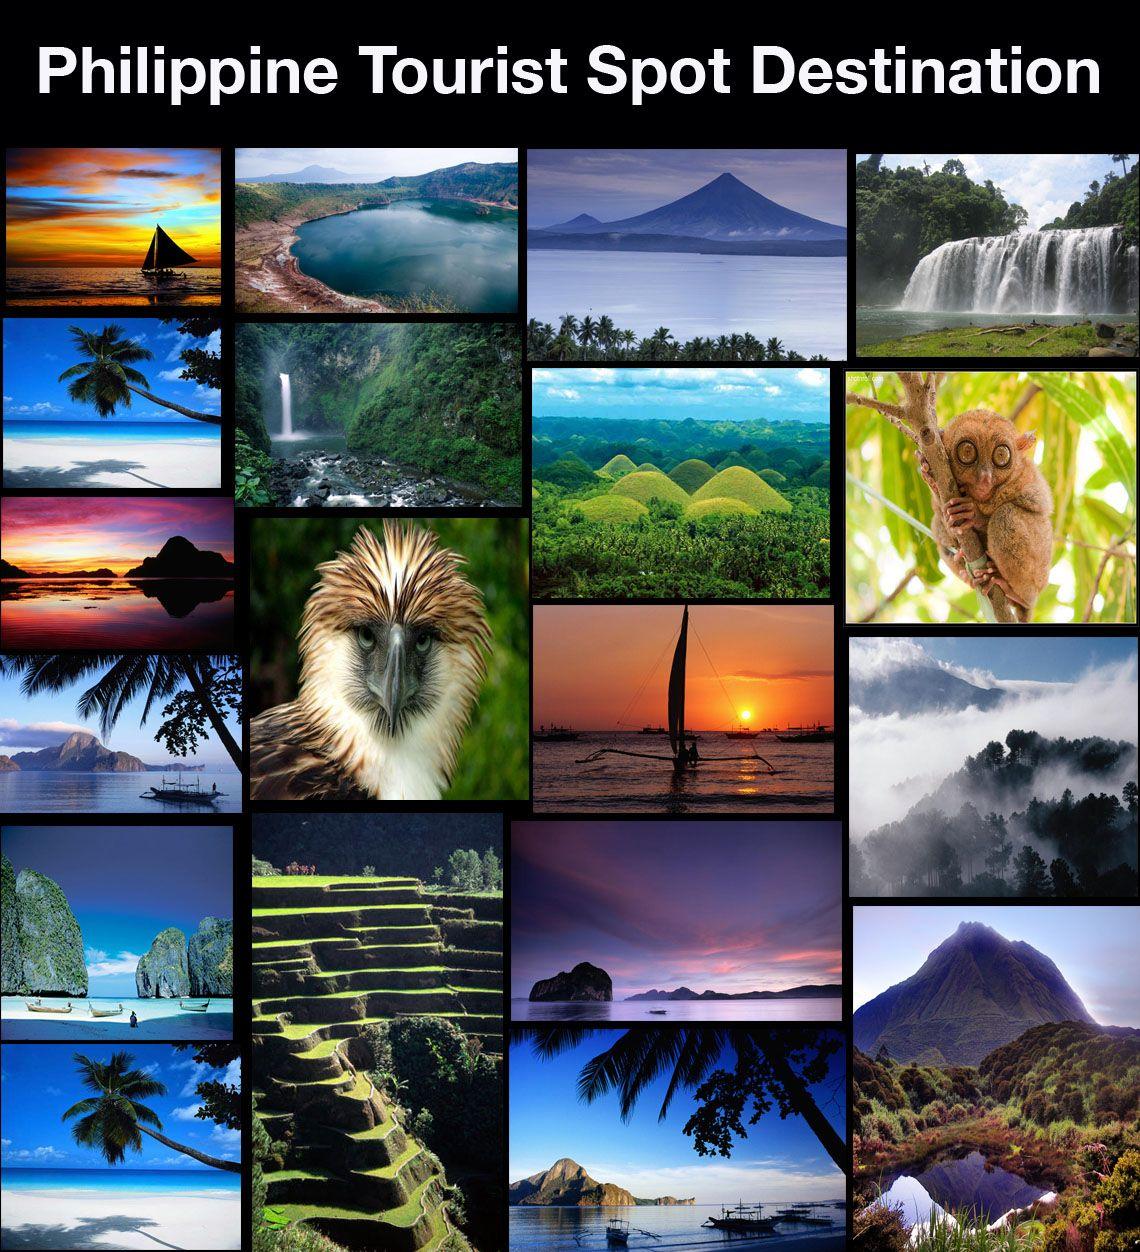 Philippine Tourist Spot Destination